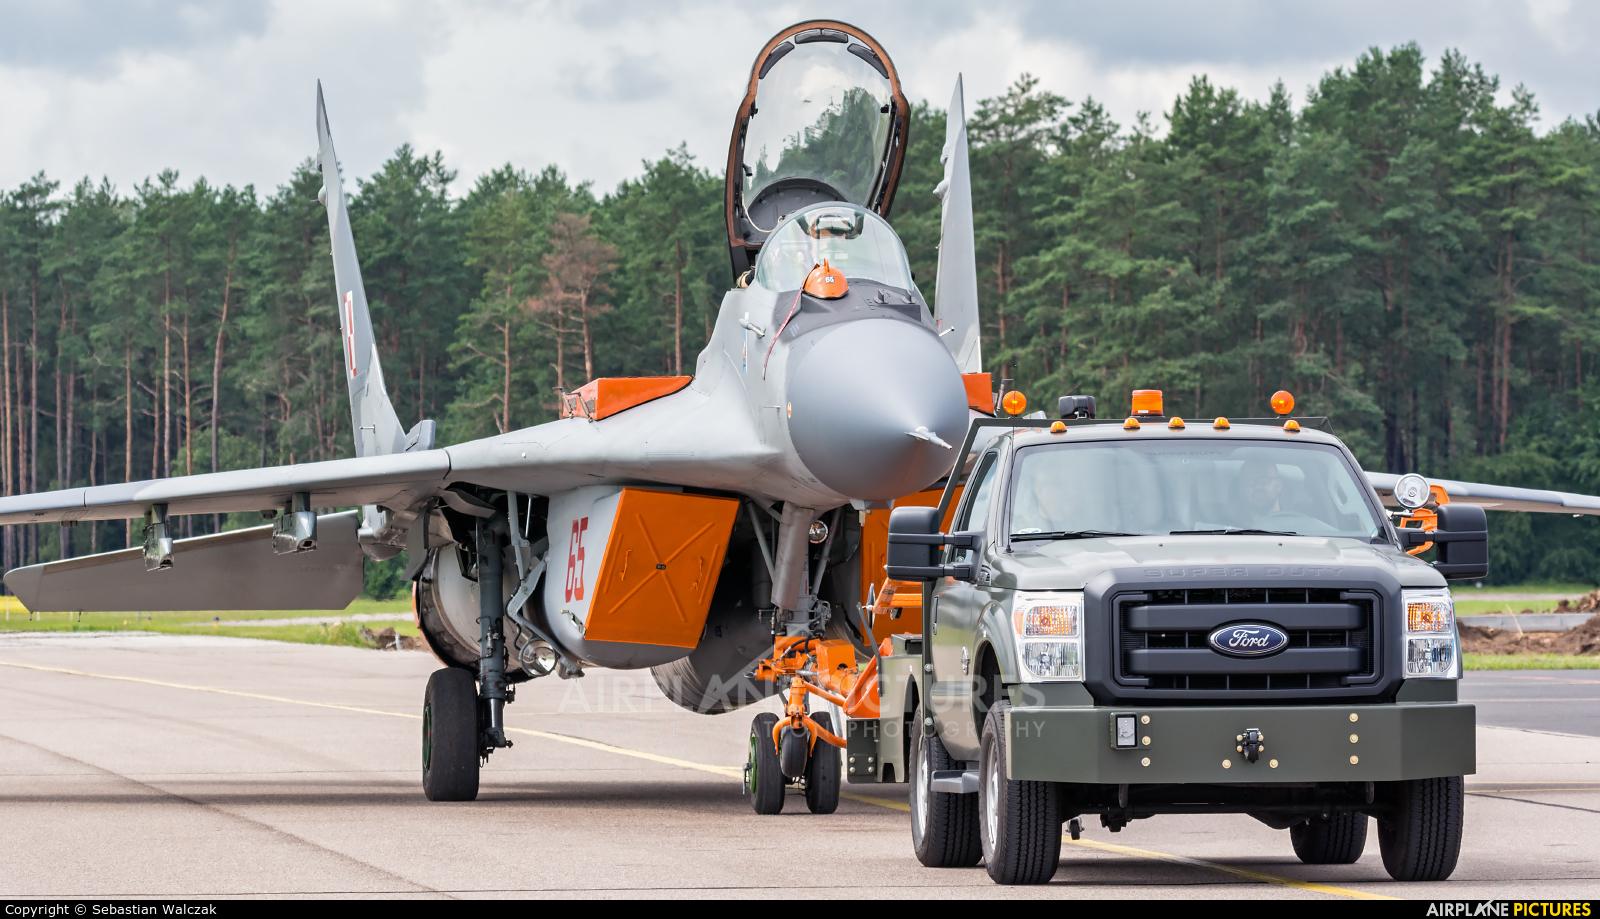 Poland - Air Force 65 aircraft at Siemirowice